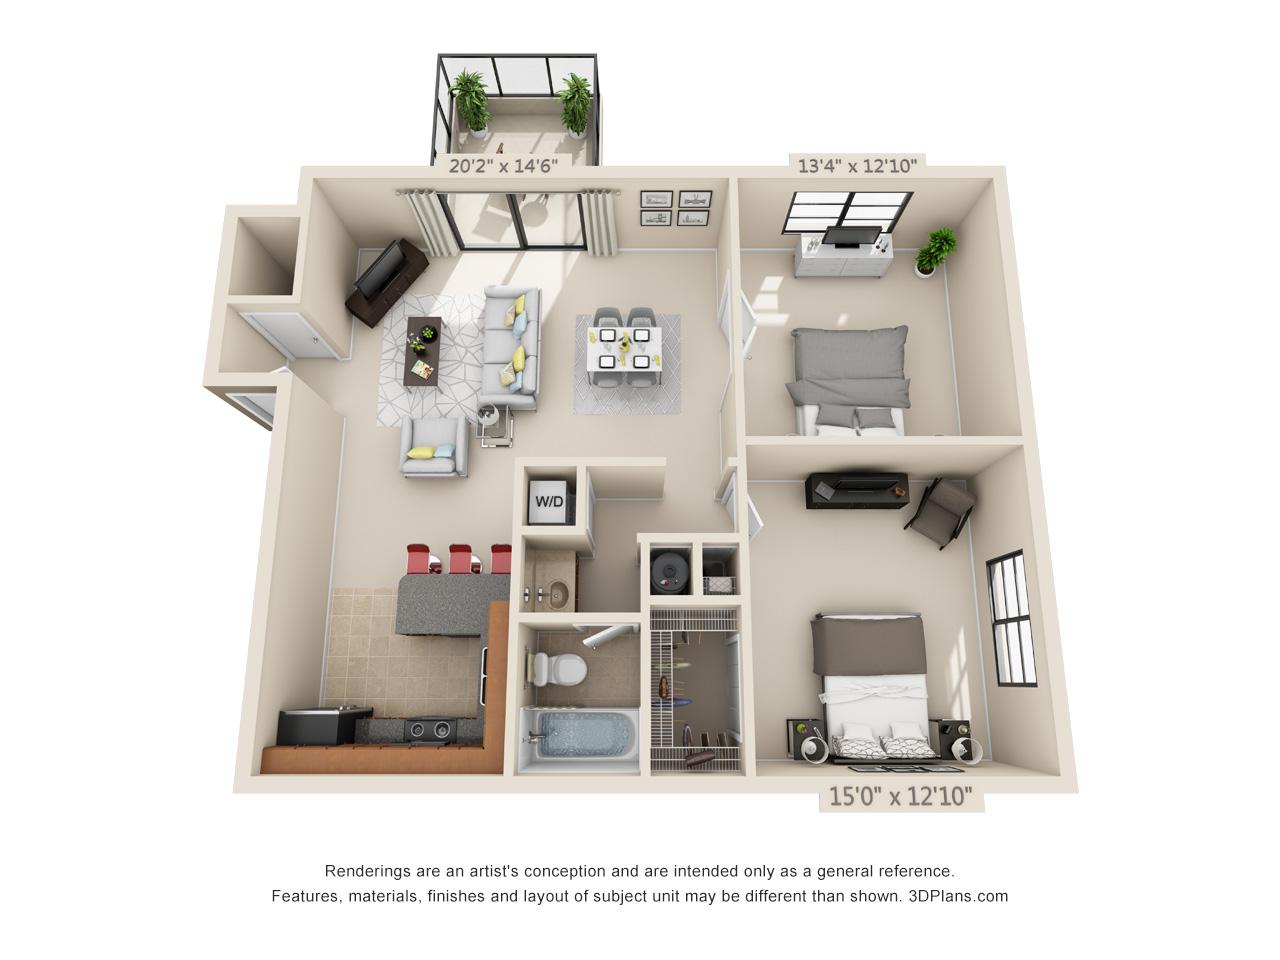 2 bedroom apartments in Boca Raton